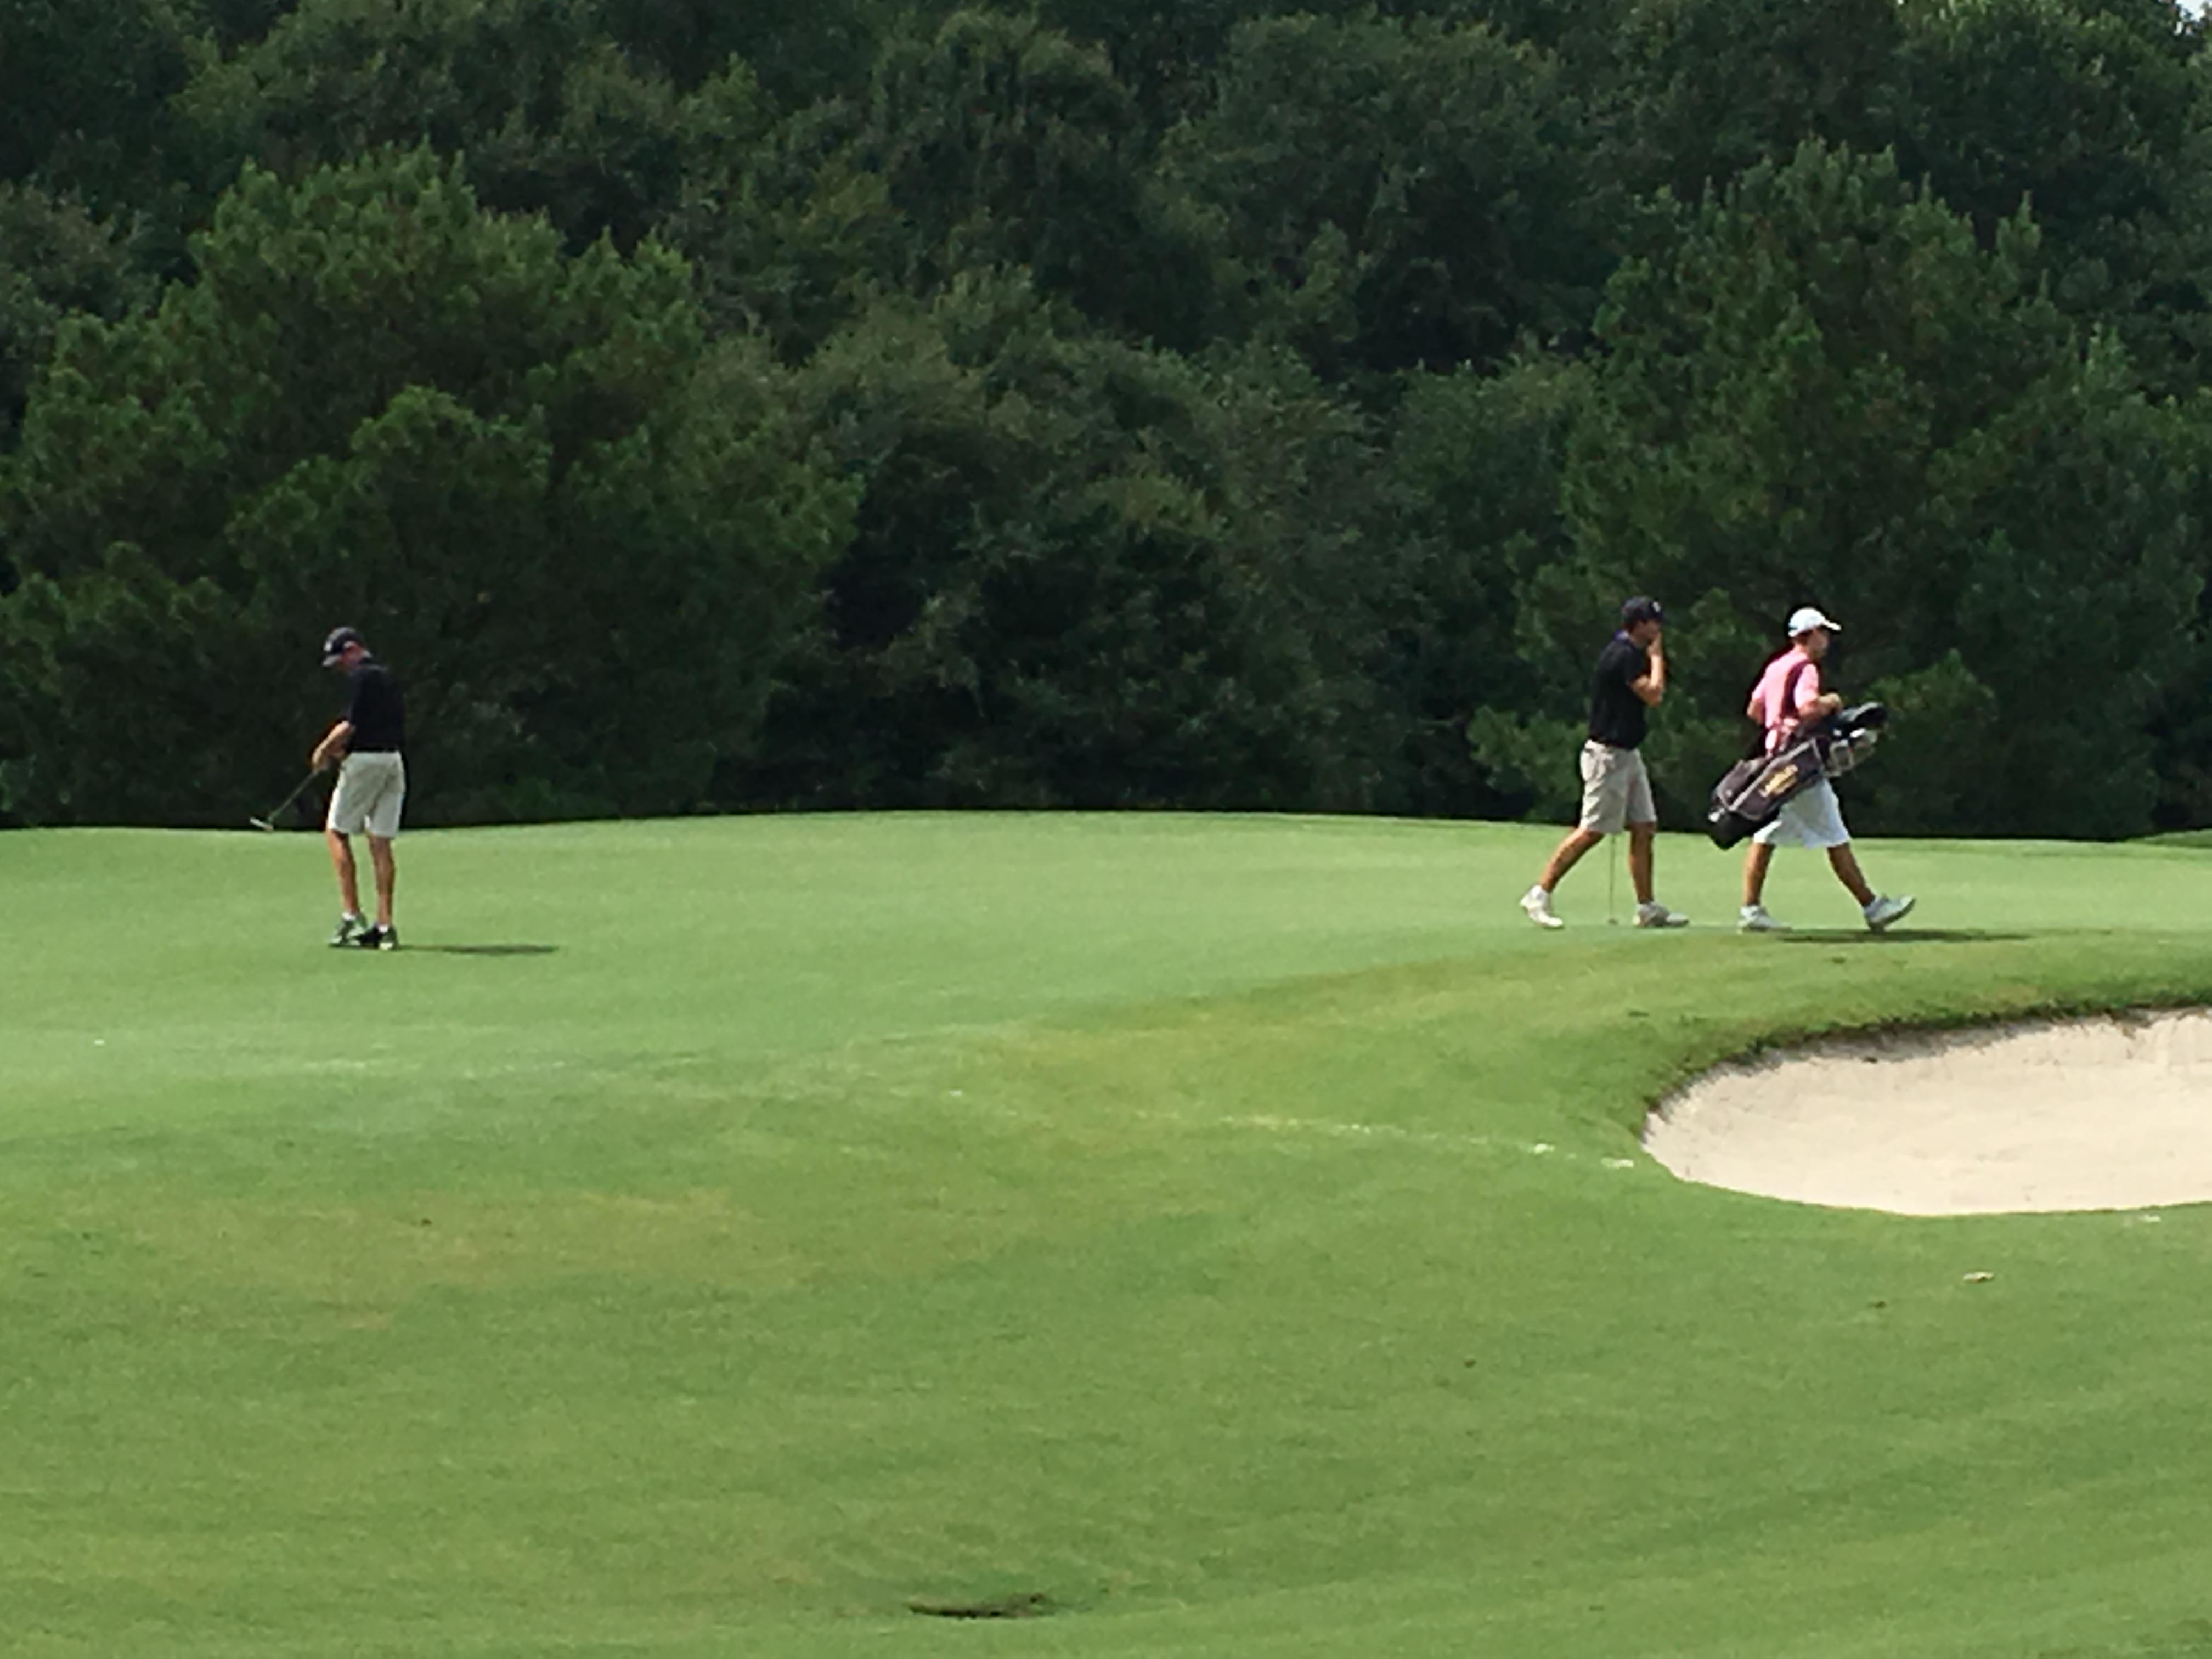 Golf Instructor Will2golf